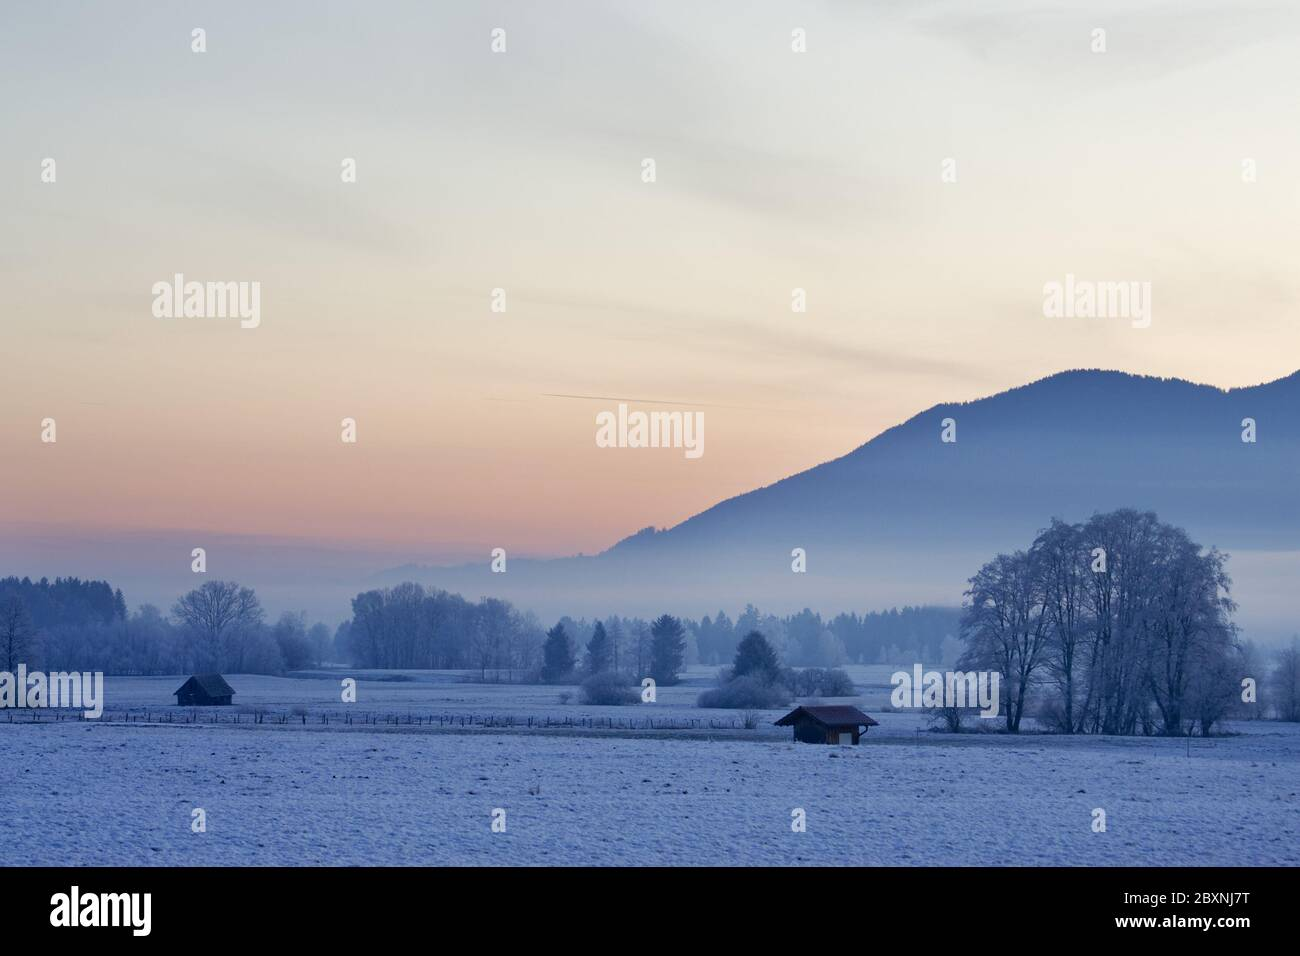 mattina umore con brina in prealpi bavaresi, germania Foto Stock